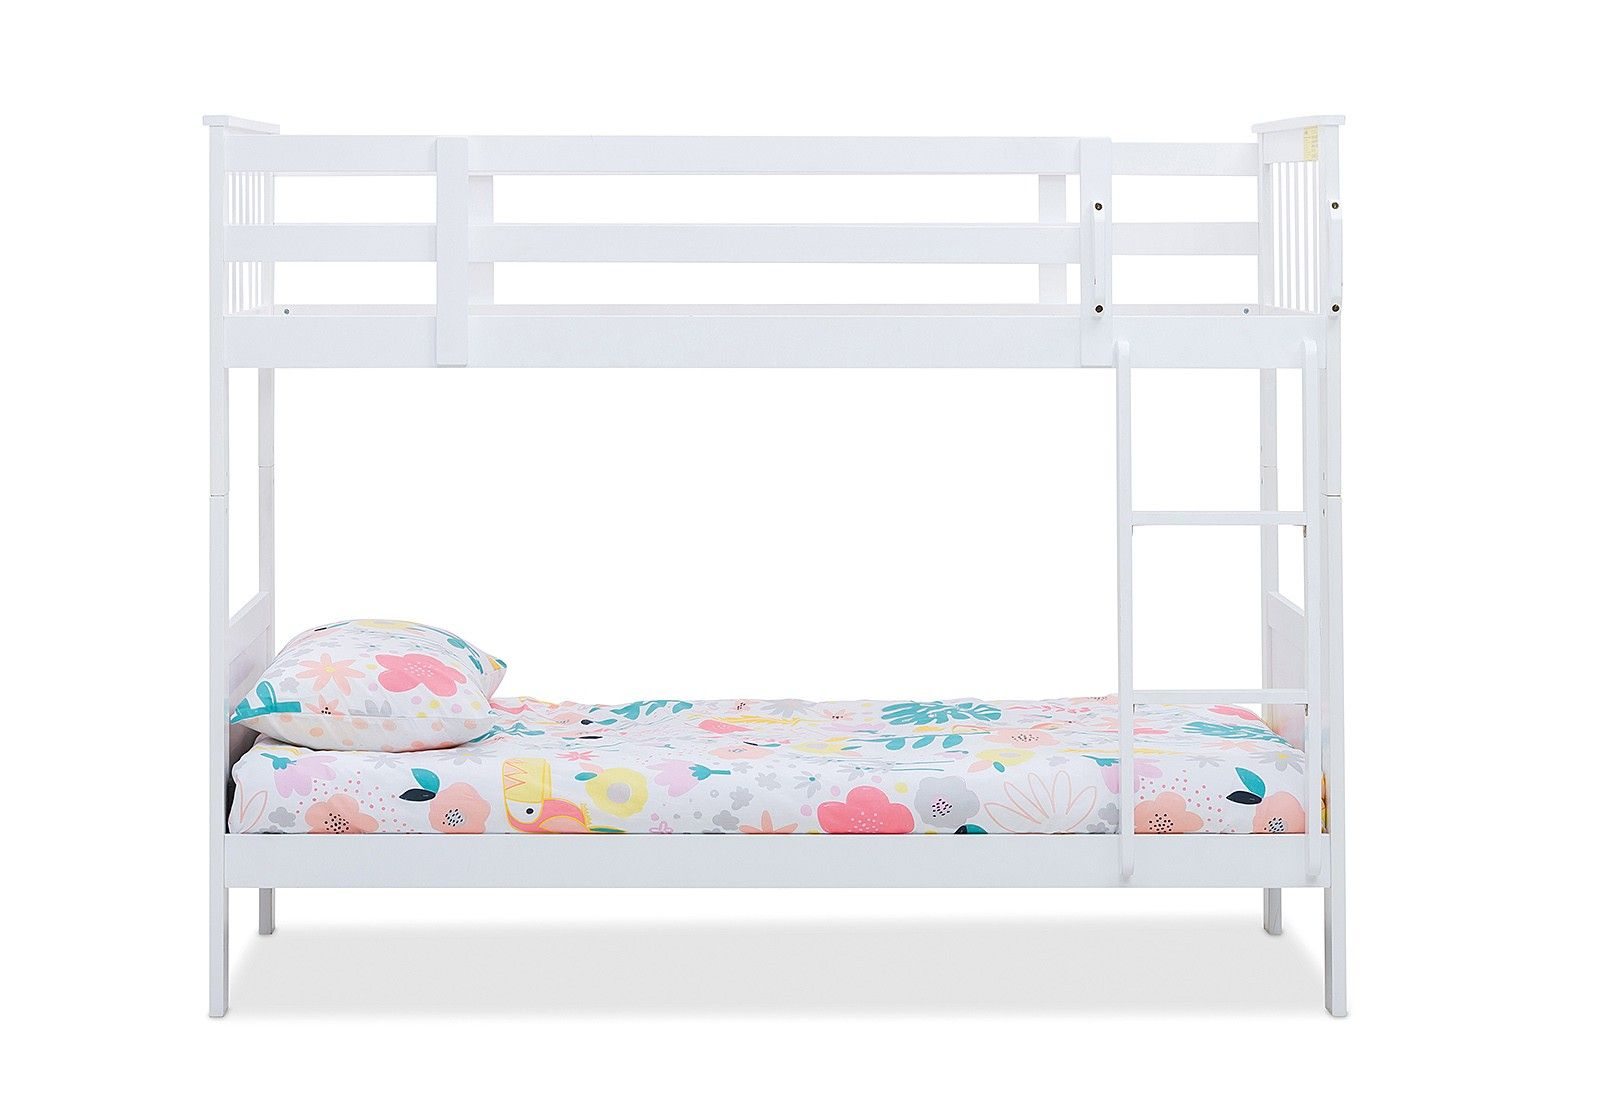 Captain Jack Cool Bunk Beds Bunk Bed Designs Bunk Beds